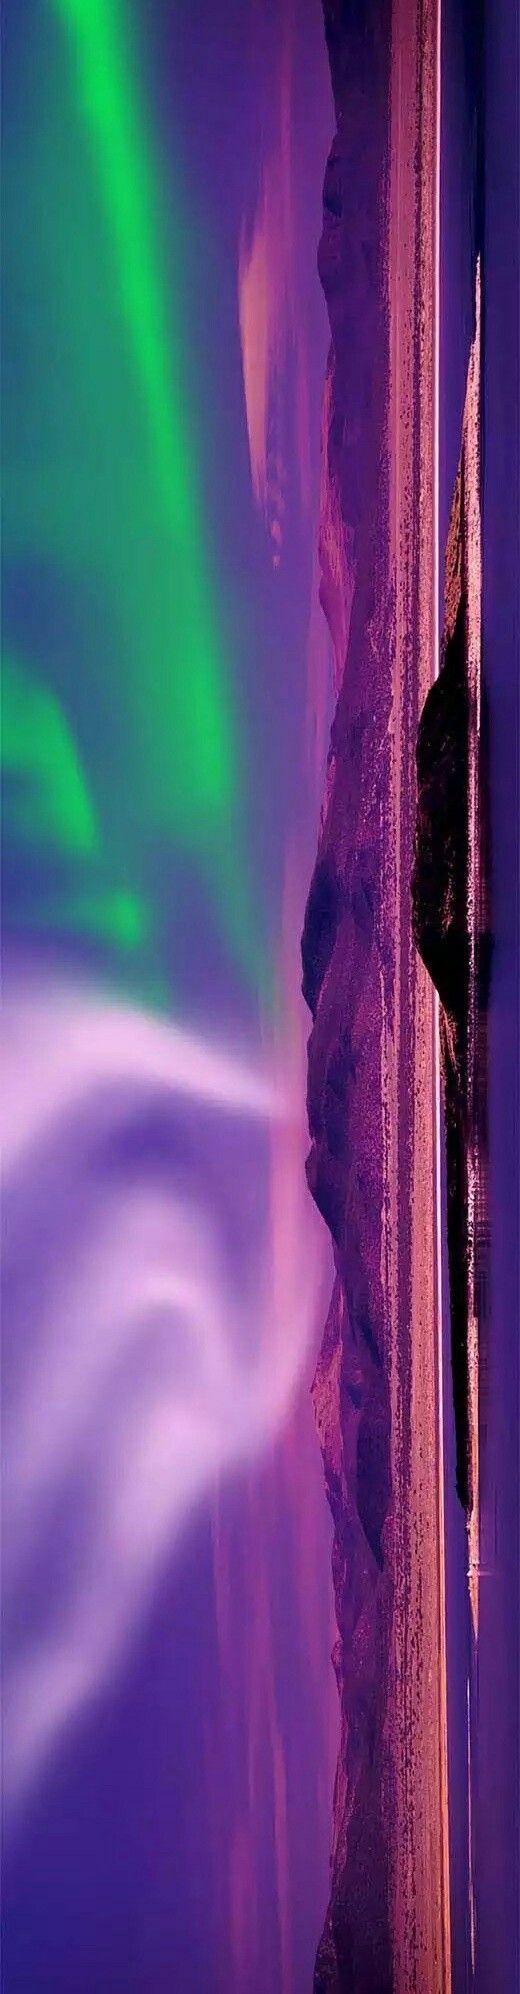 Spectacular Aurora Borealis Northern Lights